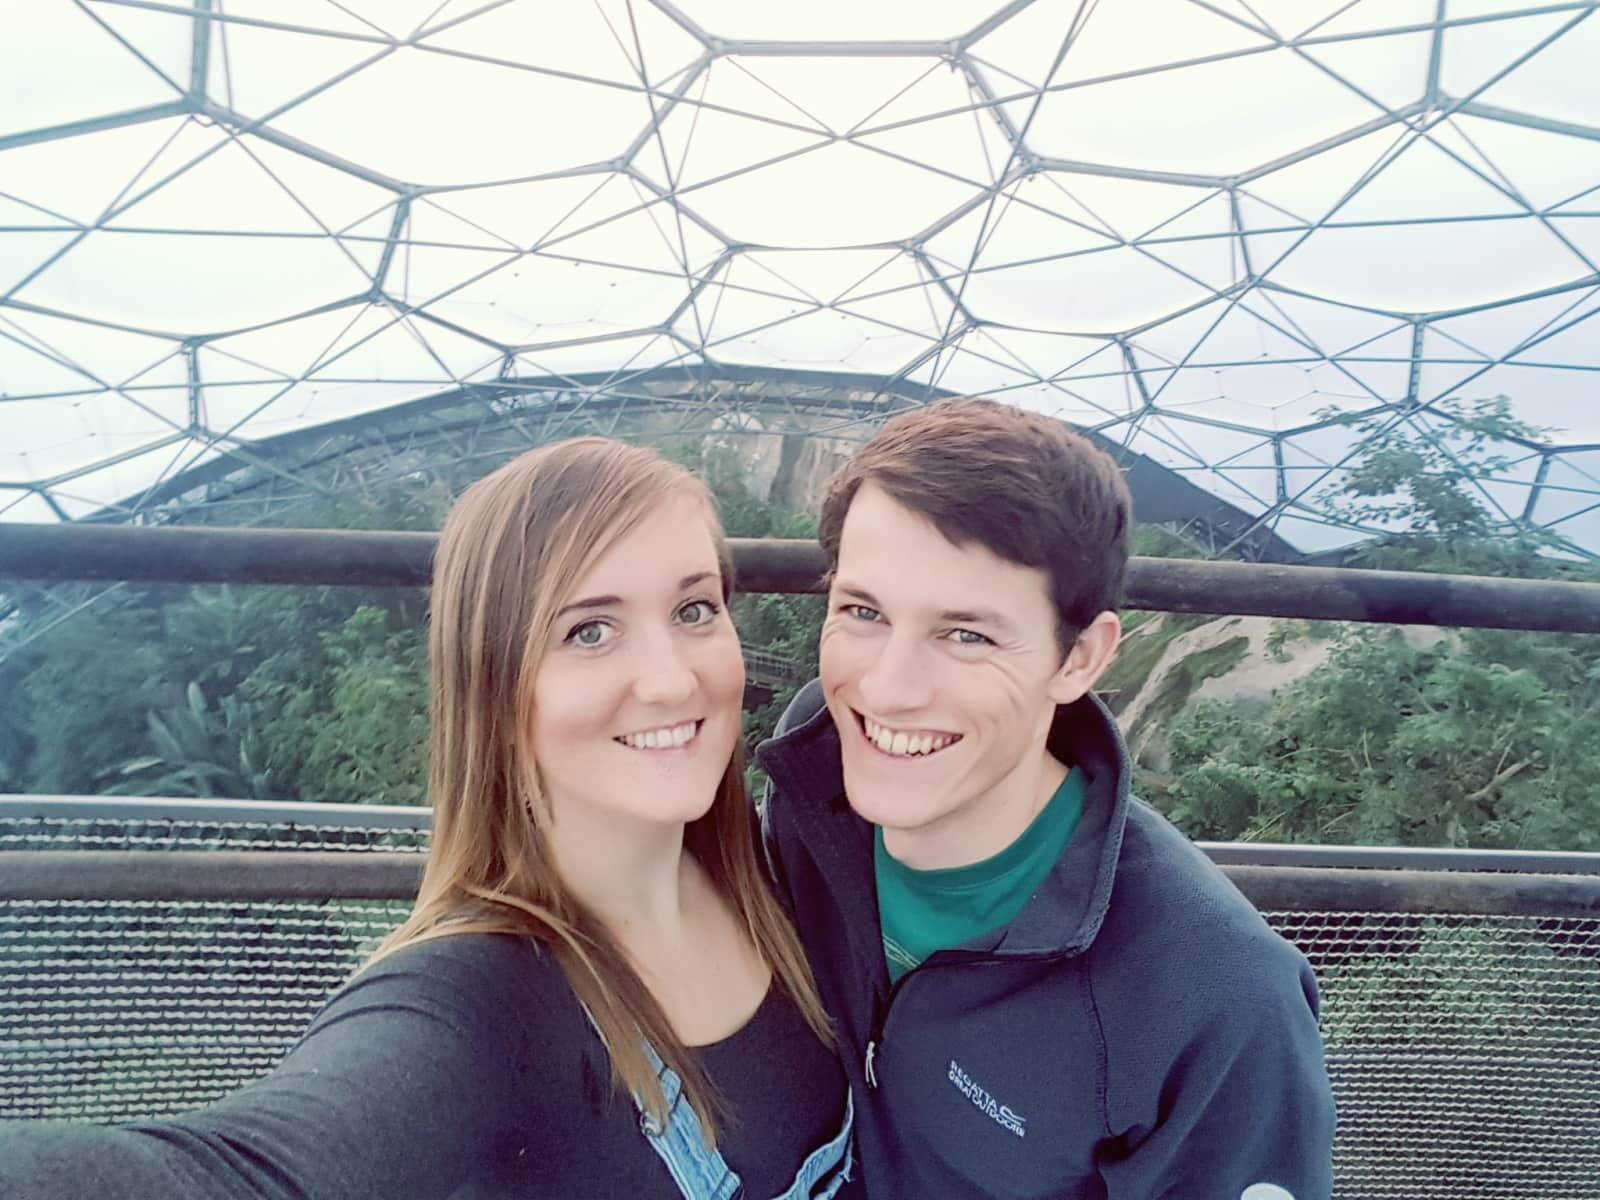 Richard & Eleanor from Sydney, New South Wales, Australia